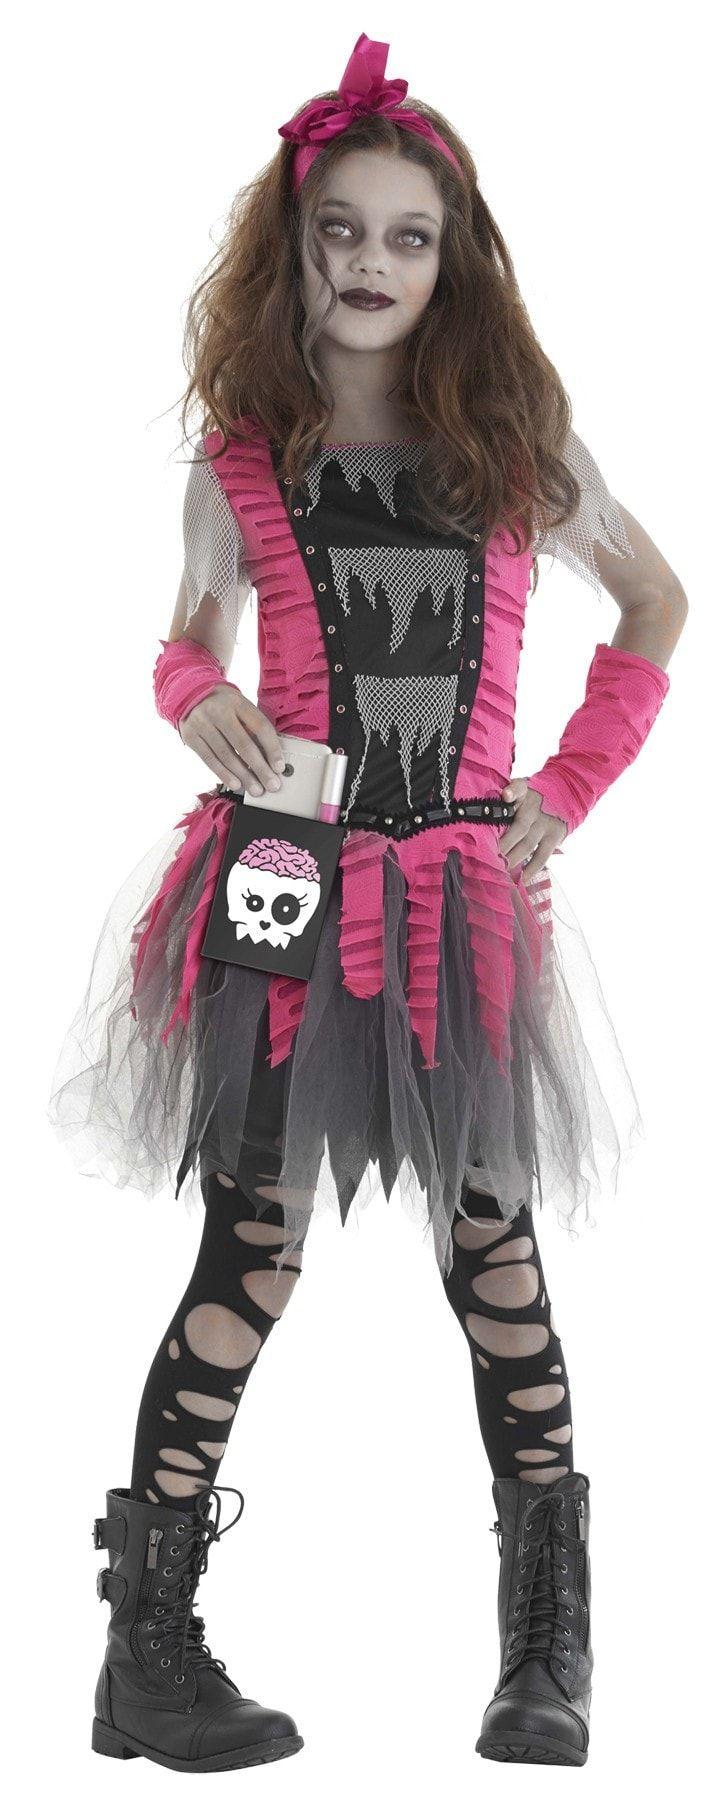 Best 25+ Zombie costumes ideas on Pinterest | Zombie makeup, Diy ...